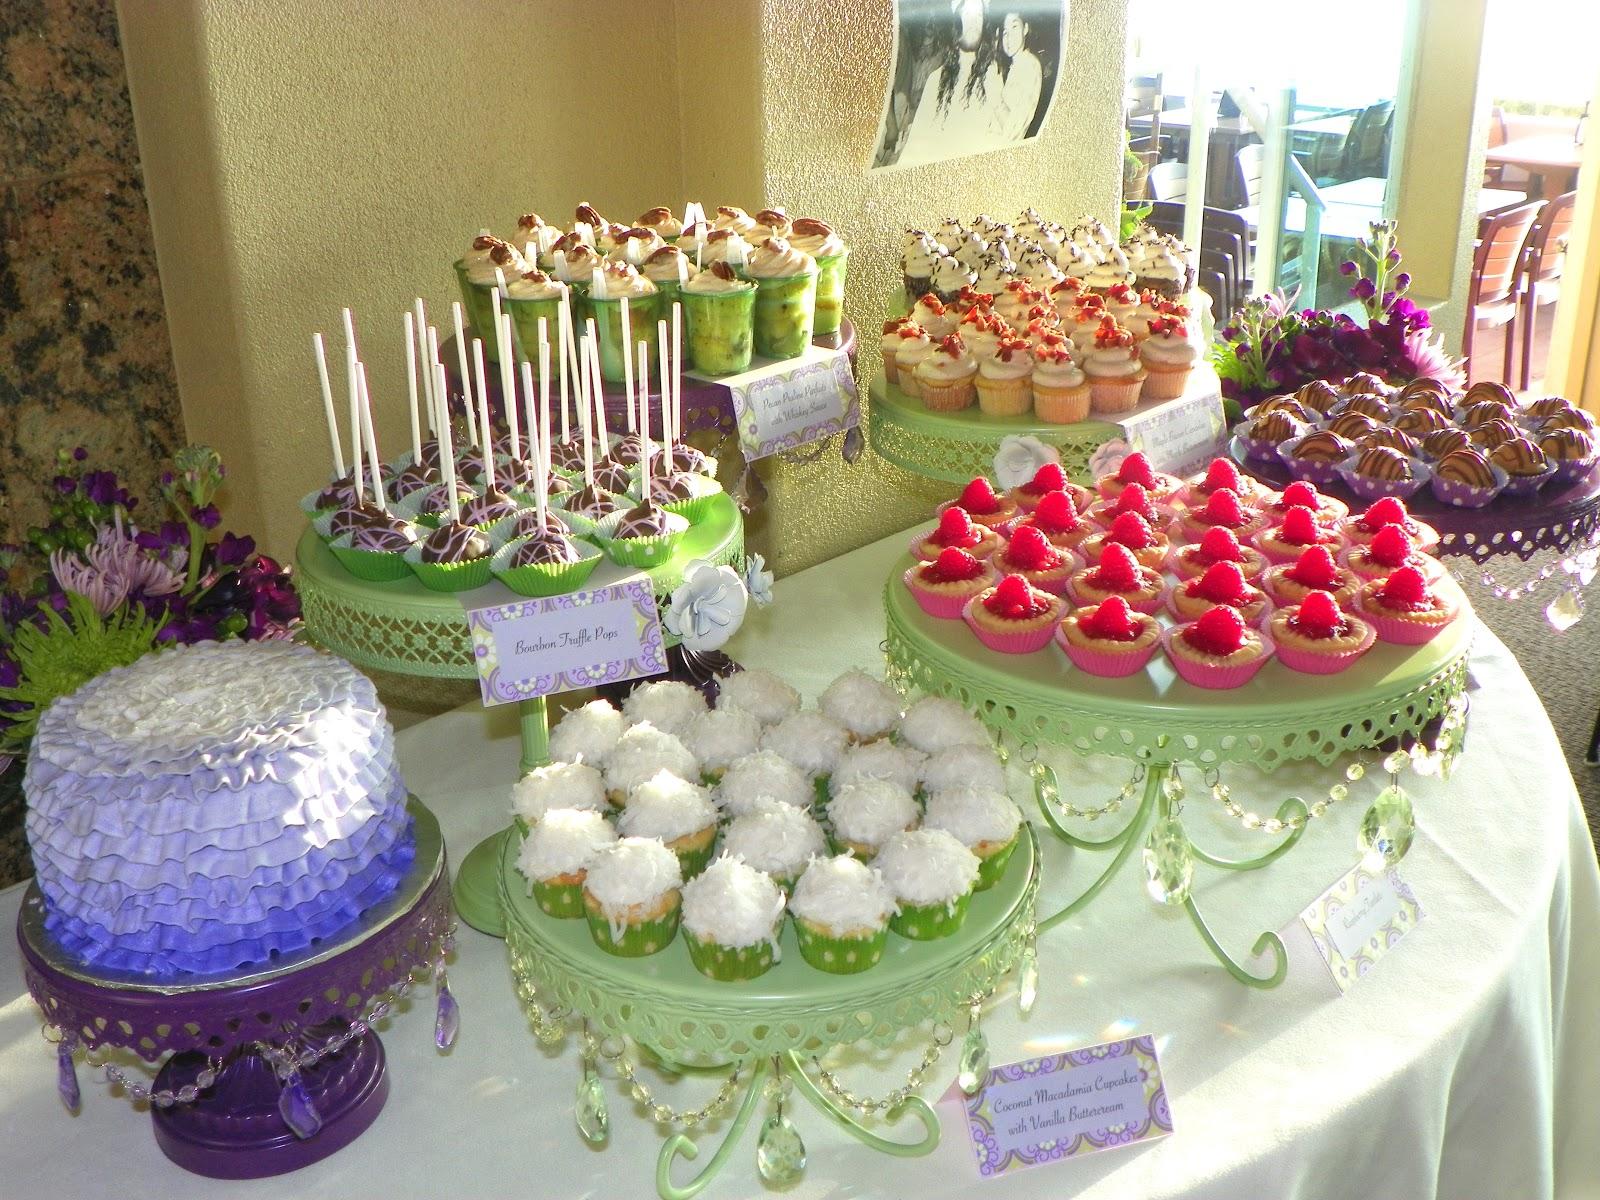 plumeria cake studio 40th birthday mini dessert buffet cake. Black Bedroom Furniture Sets. Home Design Ideas